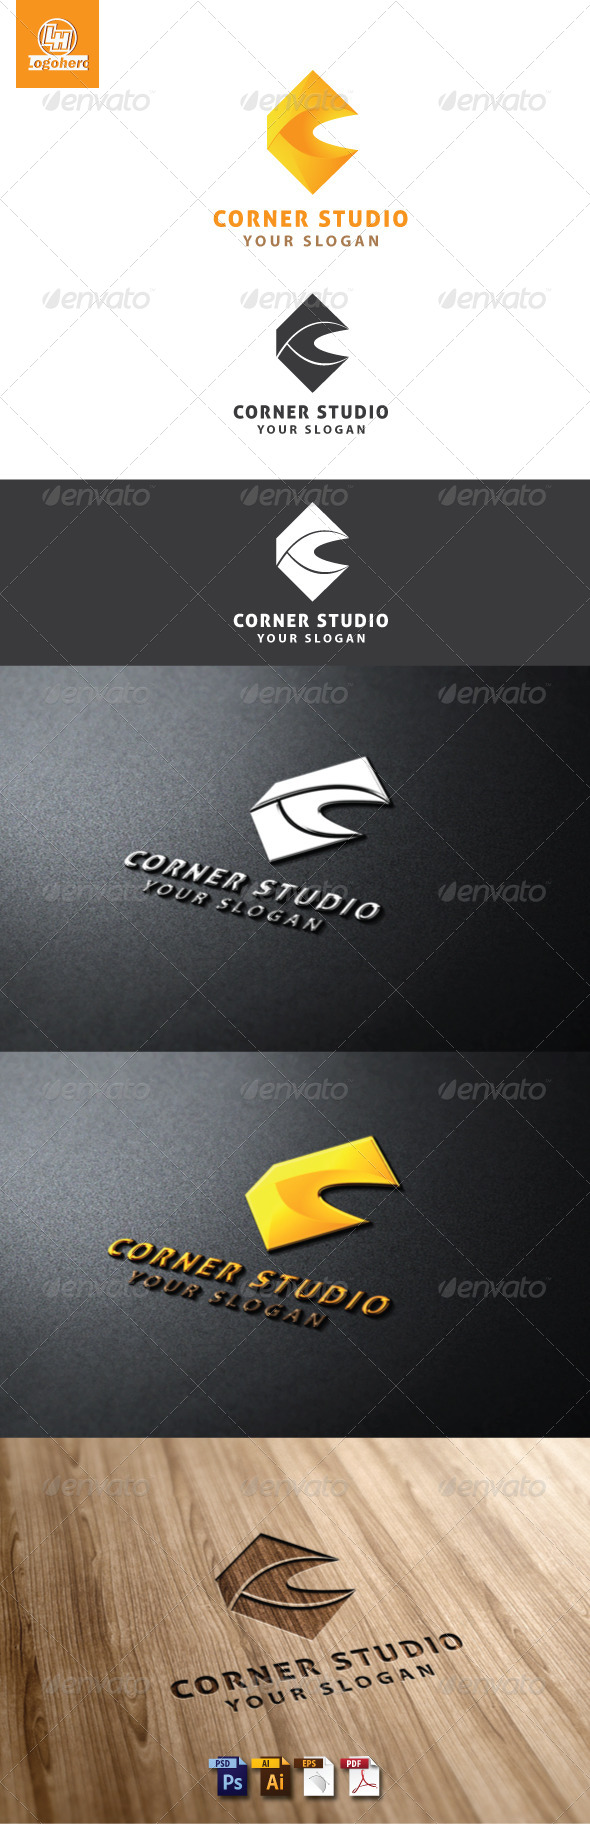 Corner Studio Logo Template